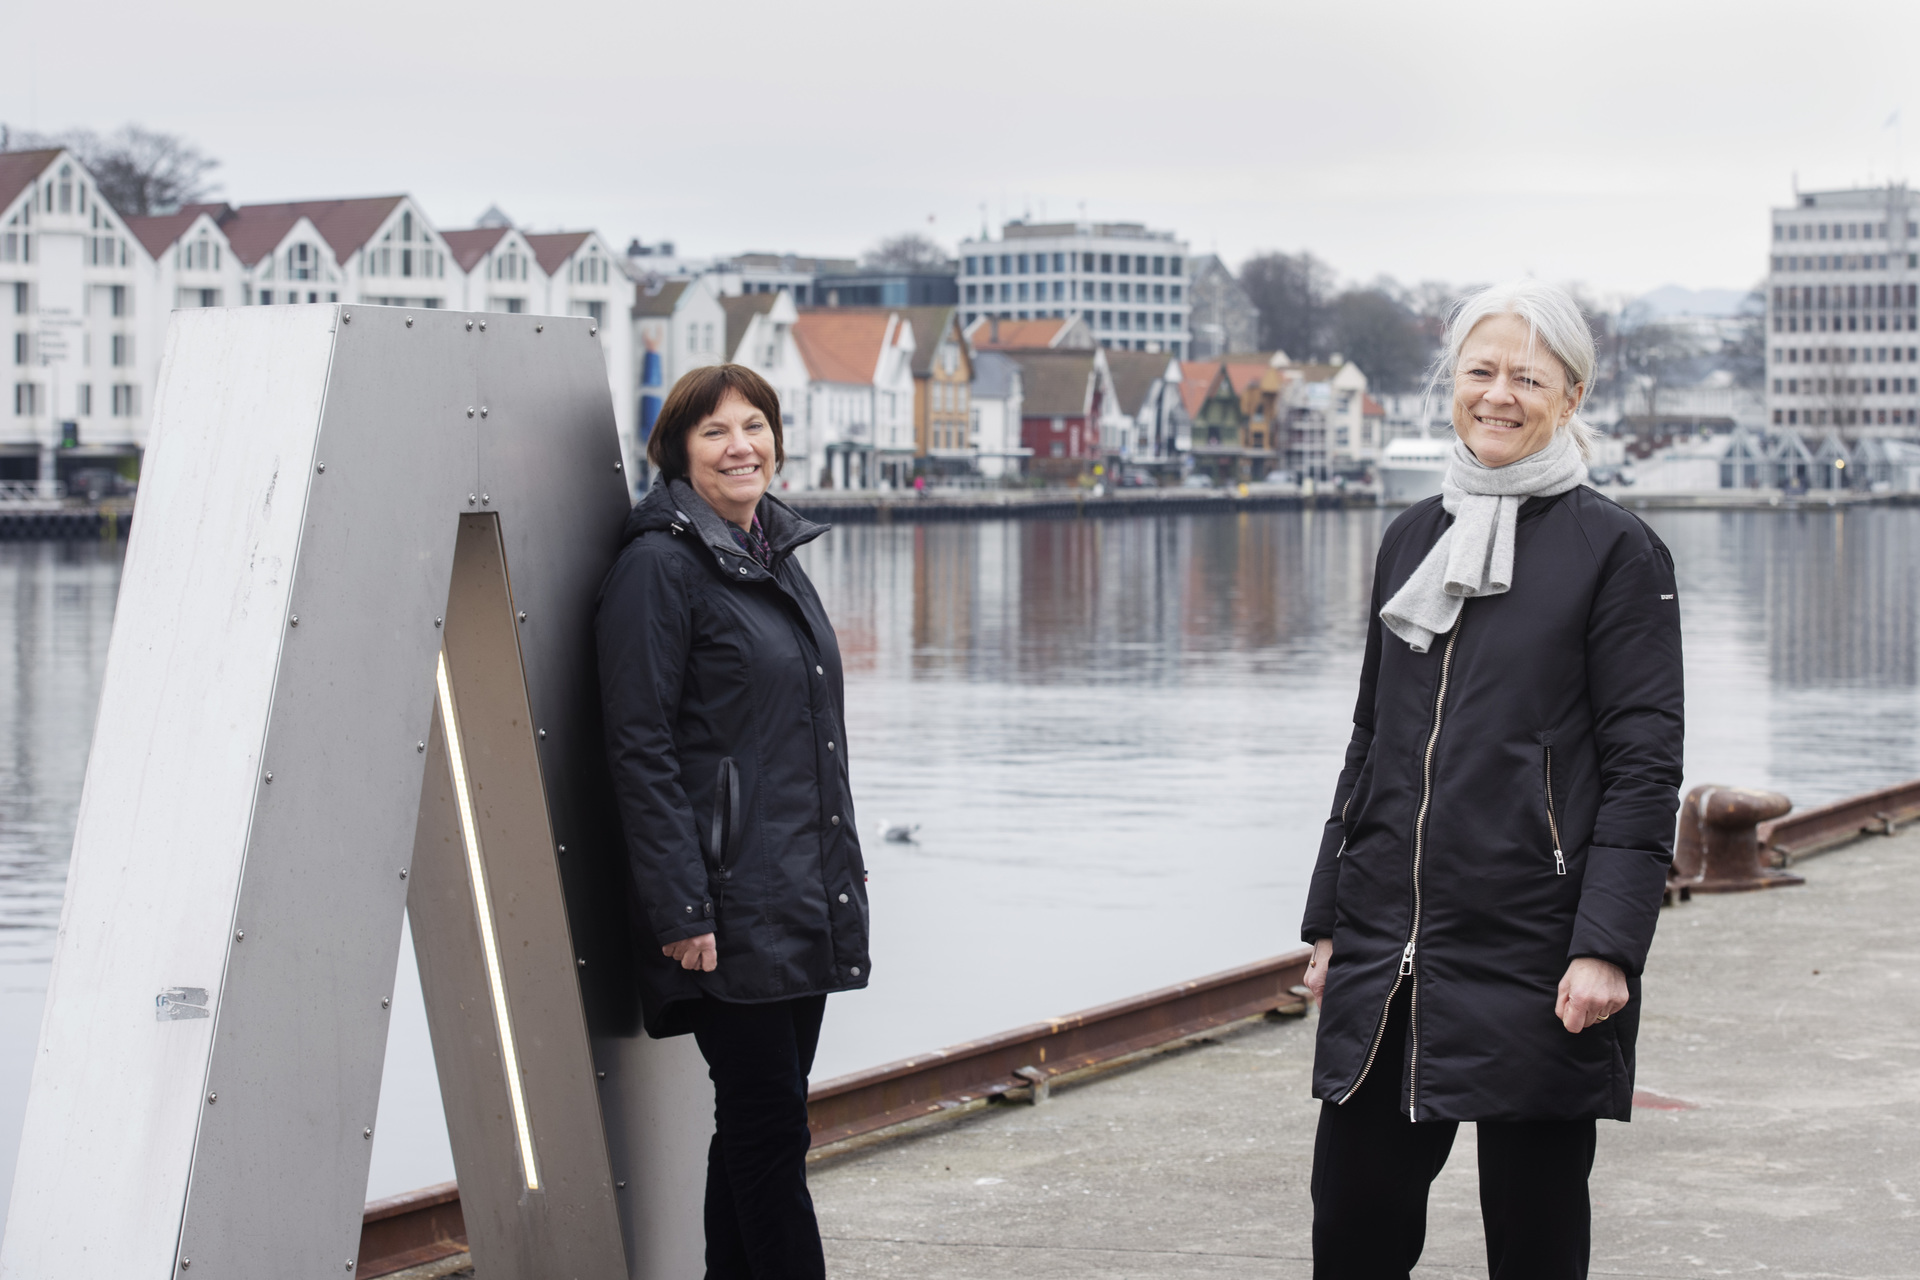 Konserndirektør Grethe Høiland i Lyse og havnedirektør Merete Eik. Foto: Marie von Krogh / Lyse